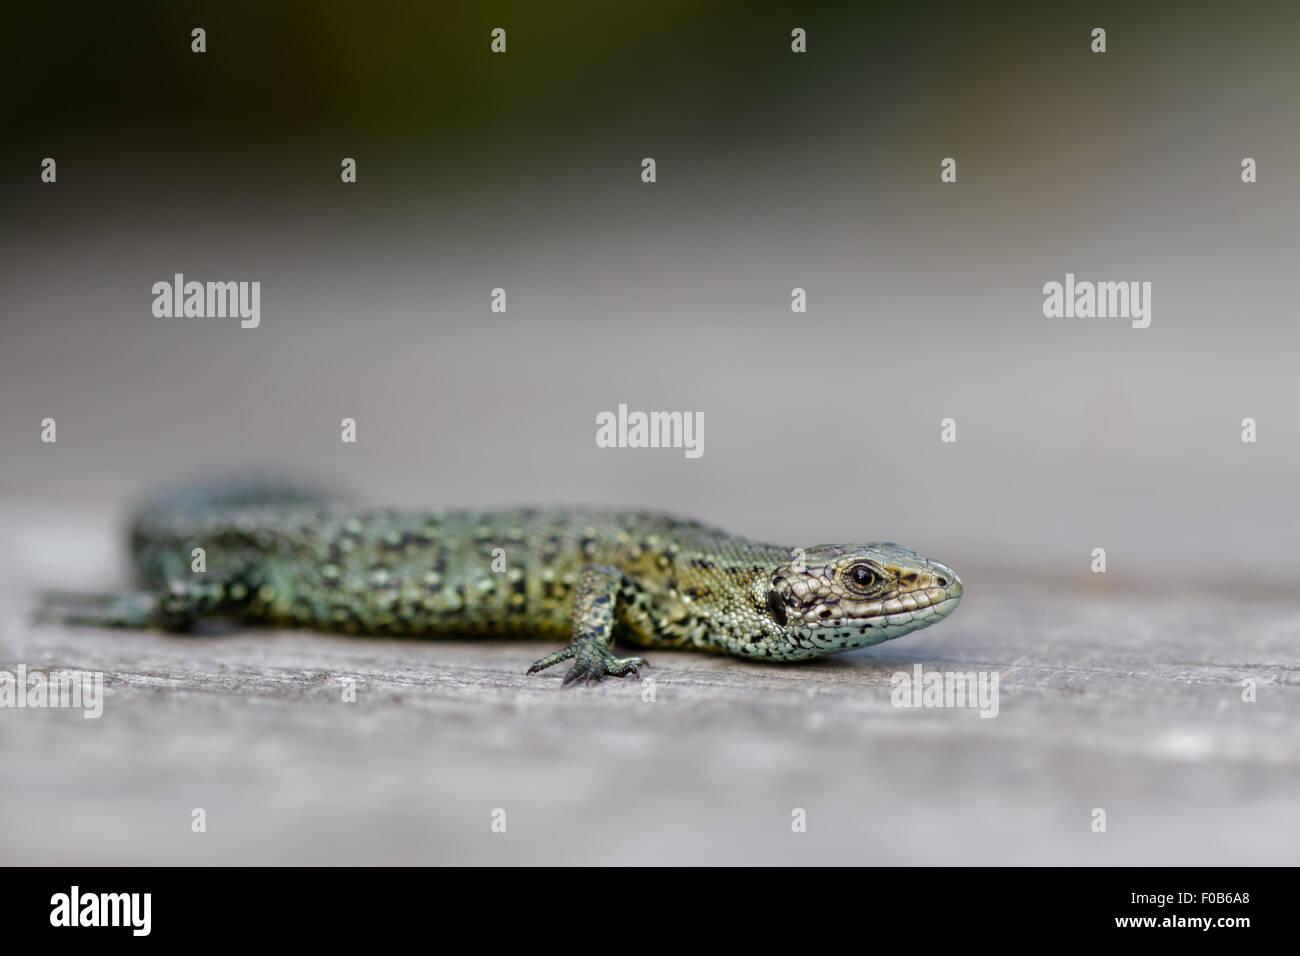 Common Lizard basking on a boardwalk. - Stock Image